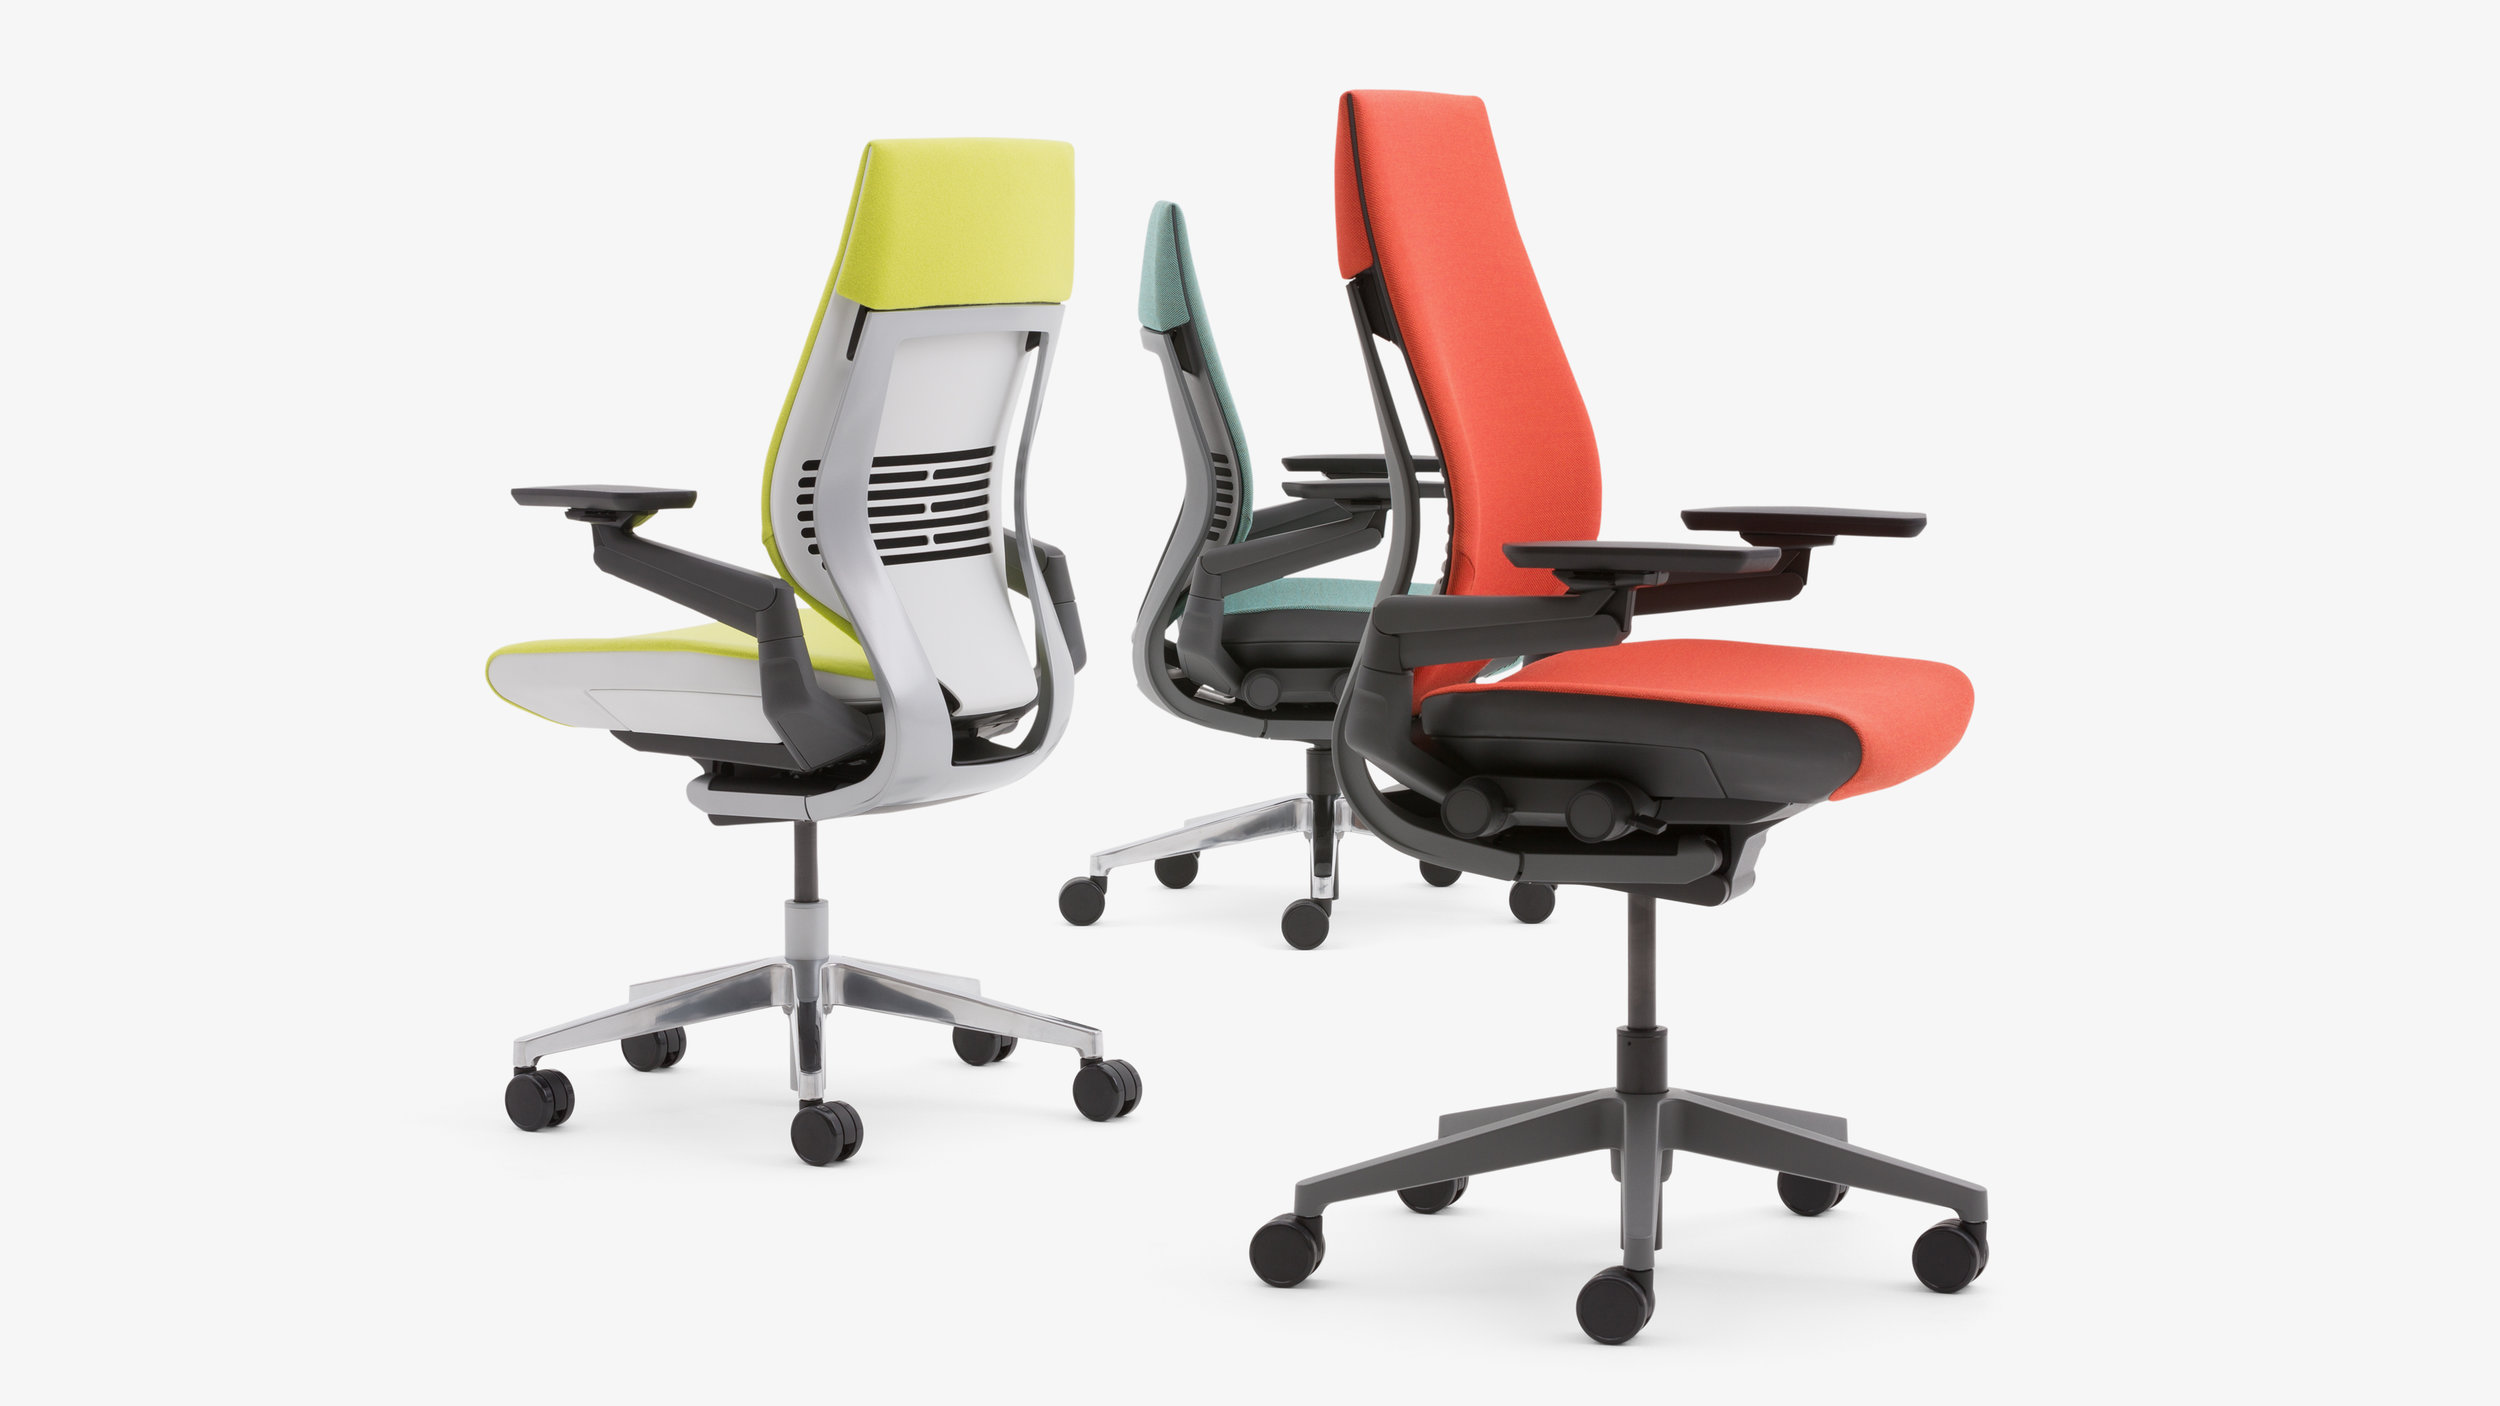 gesture-chairs-color-14-00034971.jpg